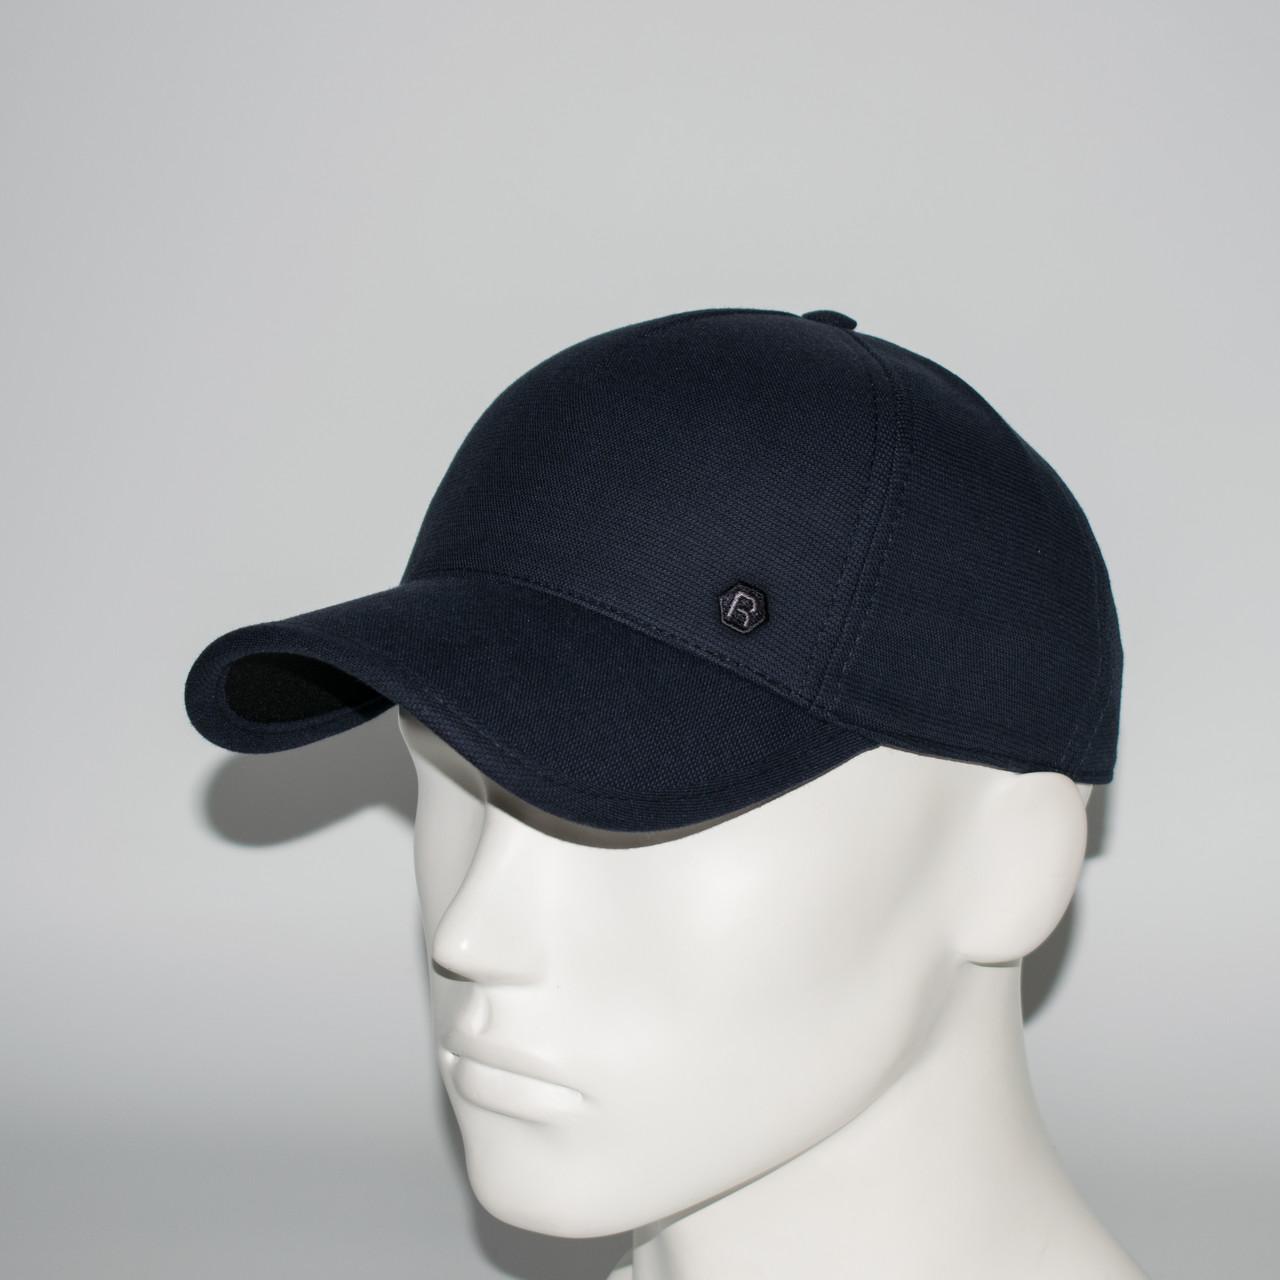 Мужская бейсболка Romax осень (код 00467)